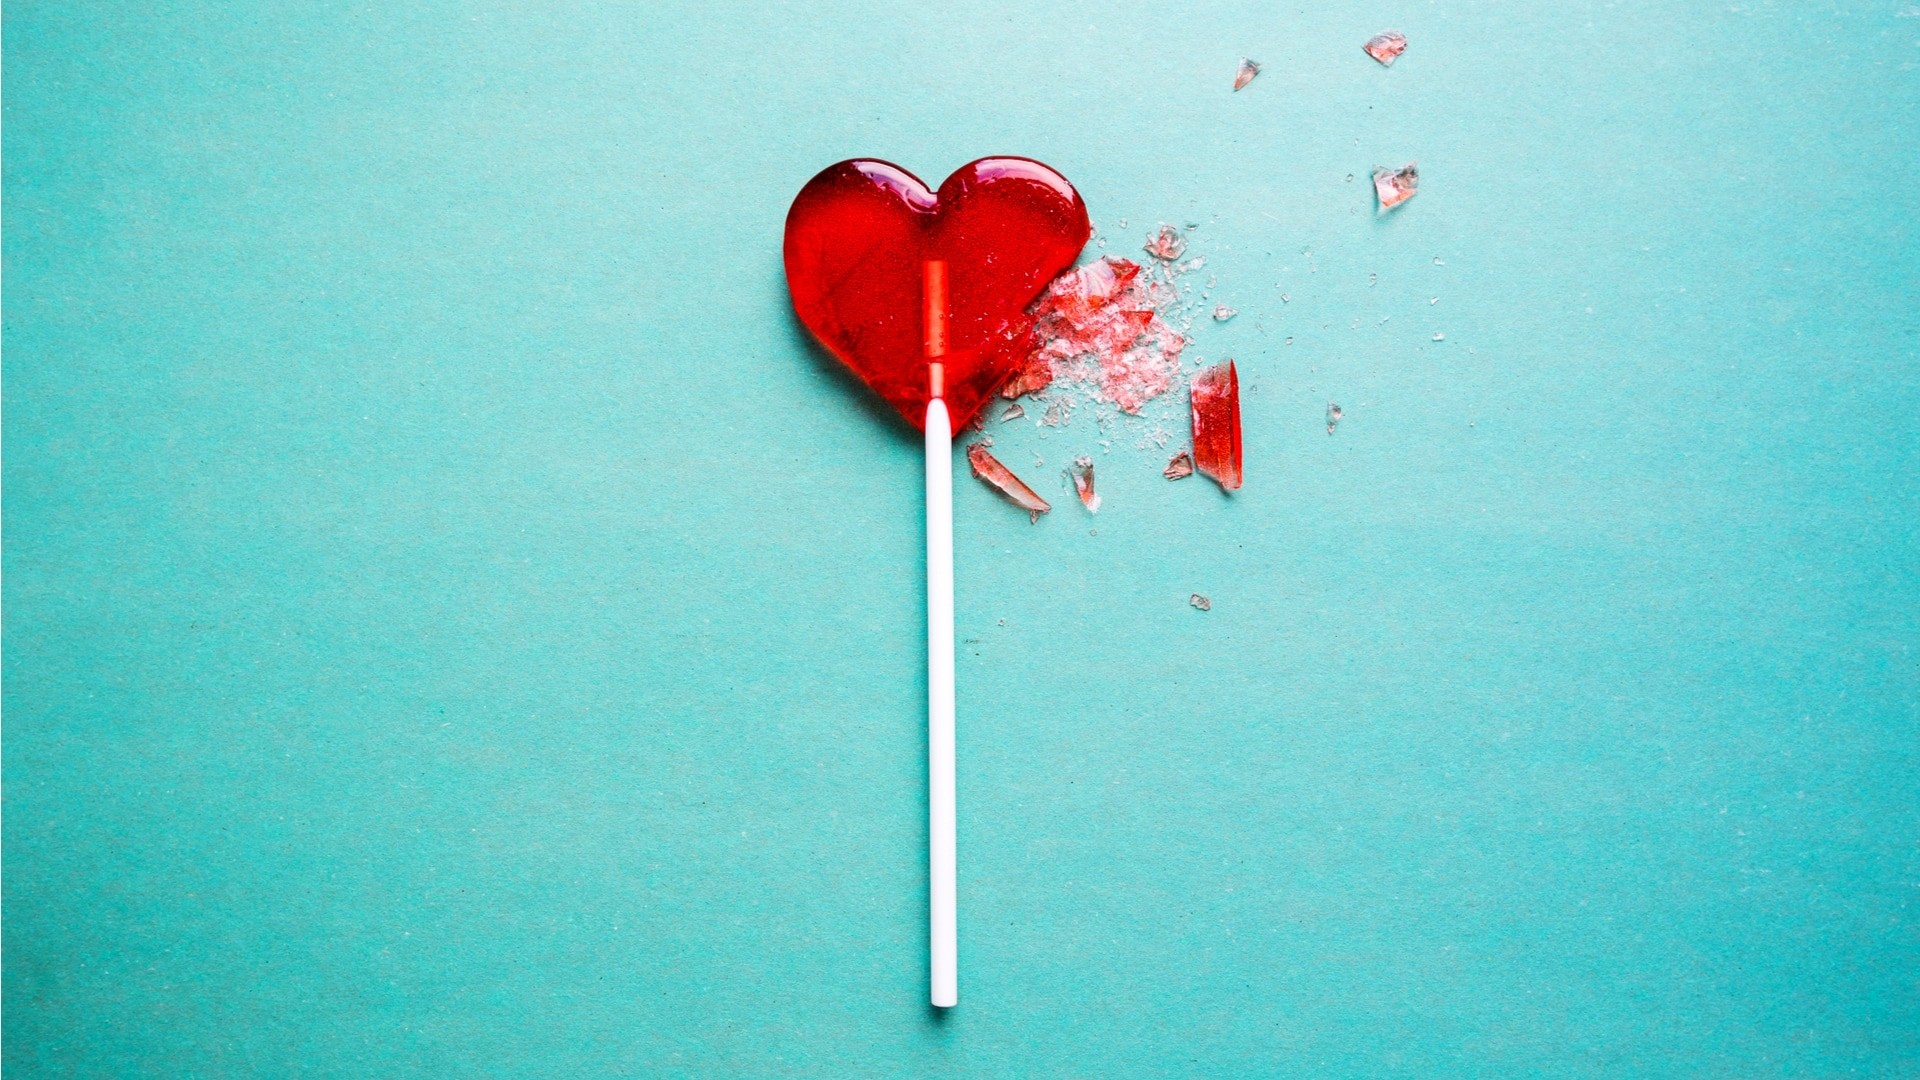 Broken Heart Wallpaper image hd